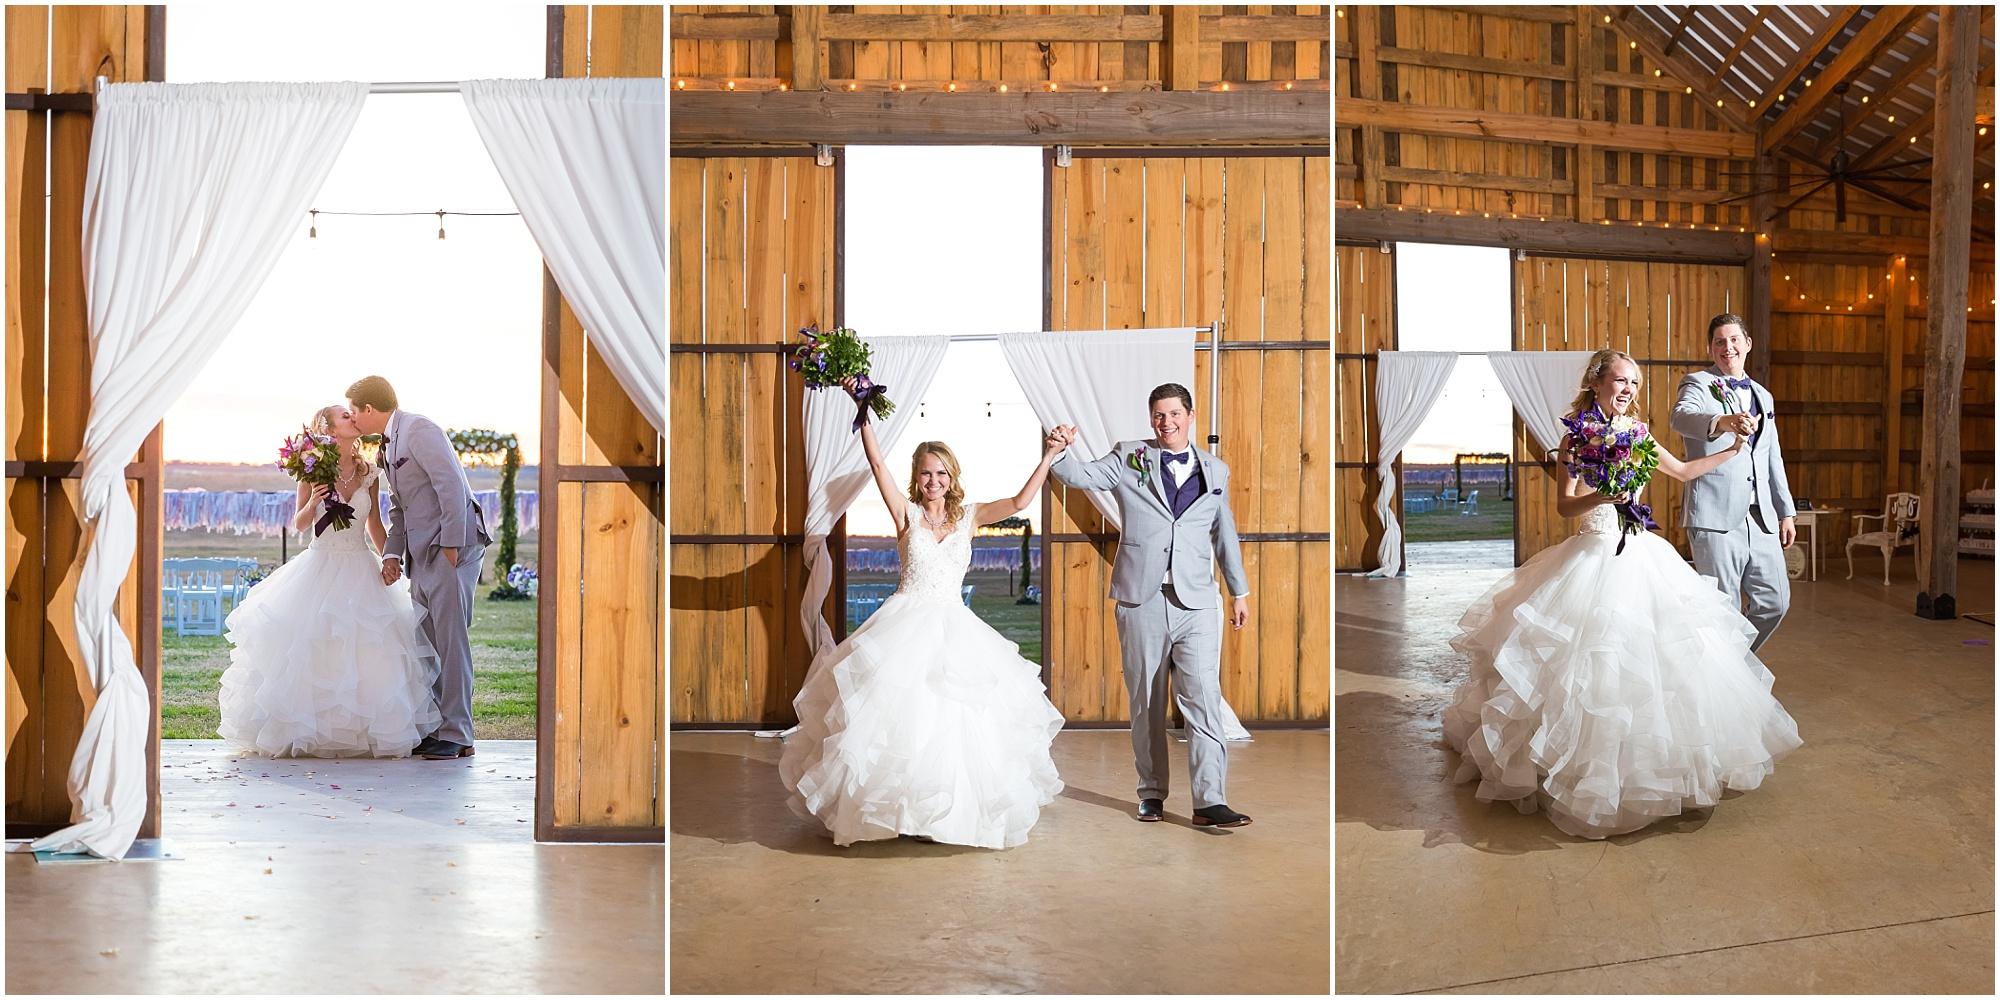 Disney-Inspired-Wedding-Central-Texas_0052.jpg